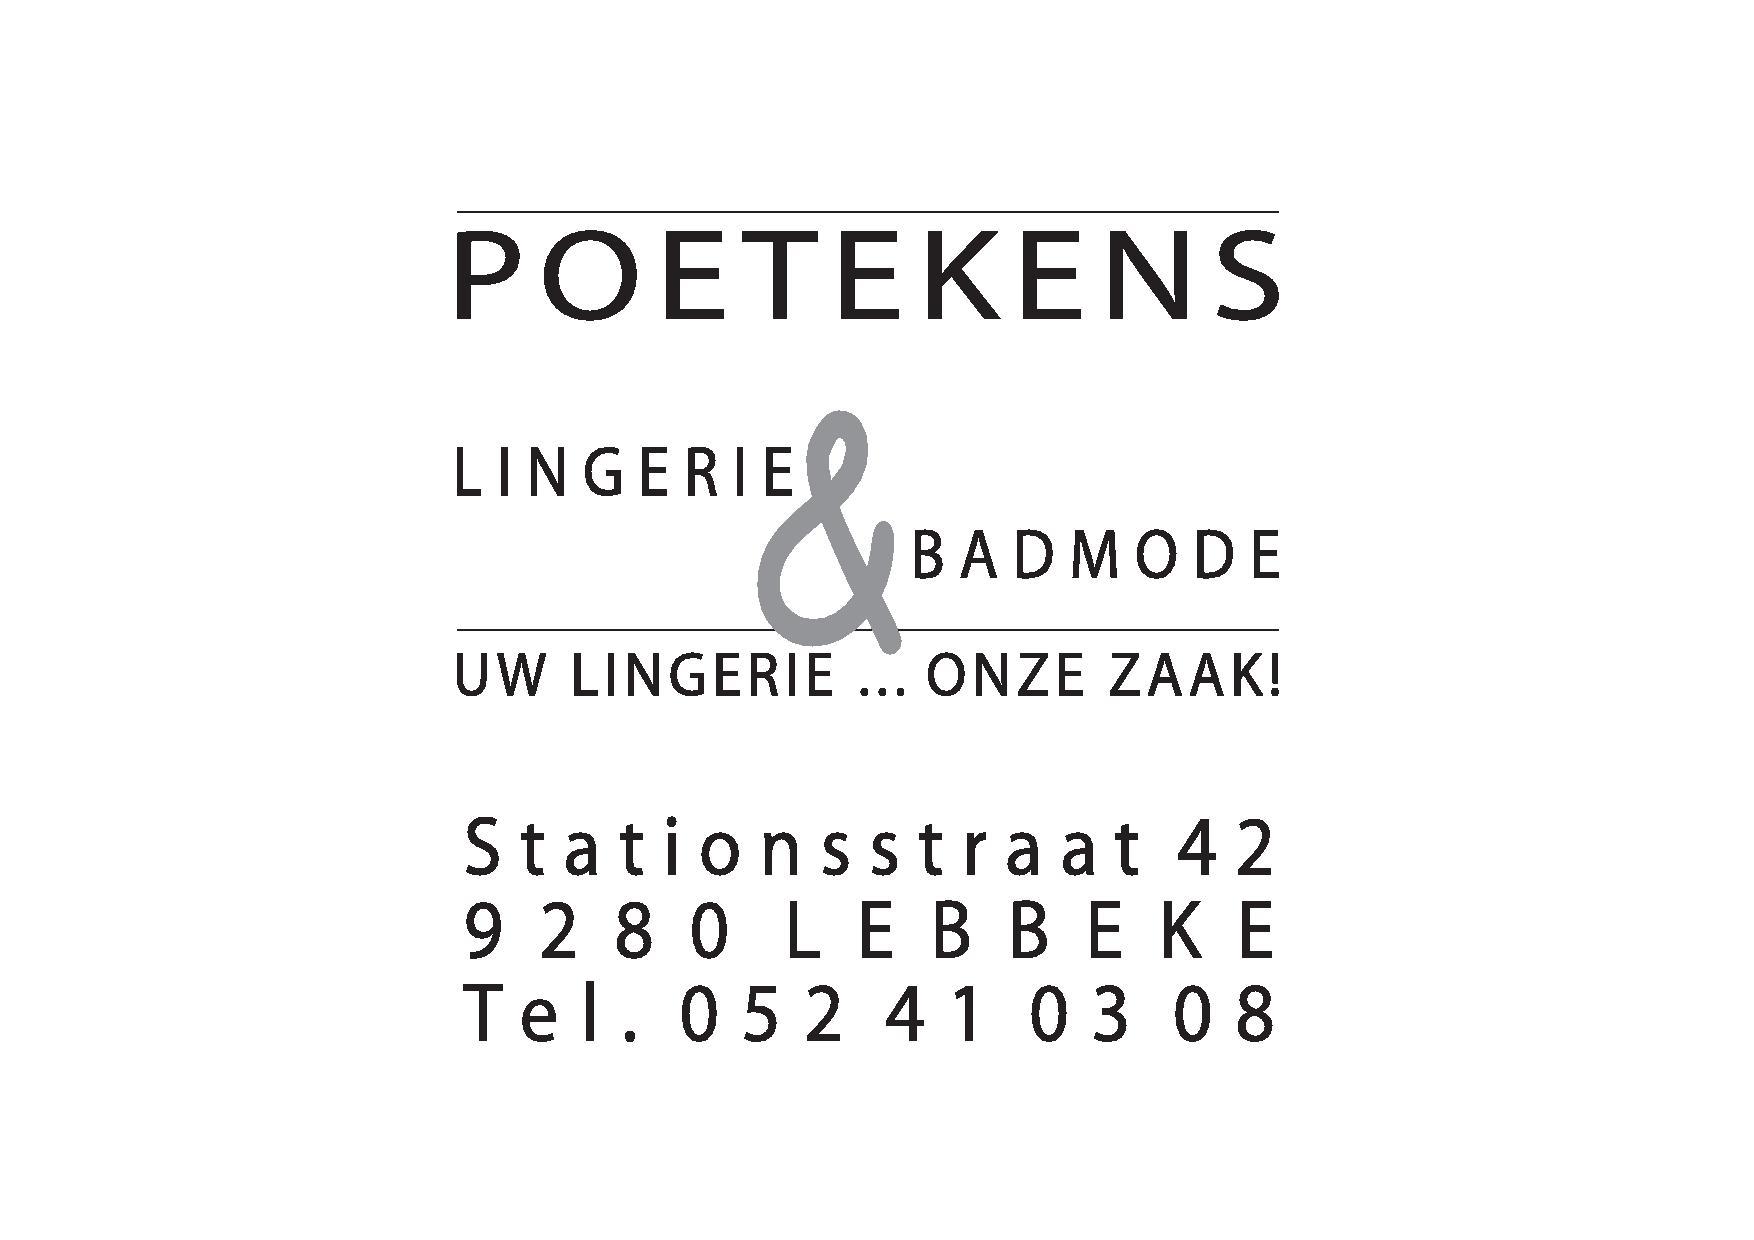 Poetekens lingerie en badmode